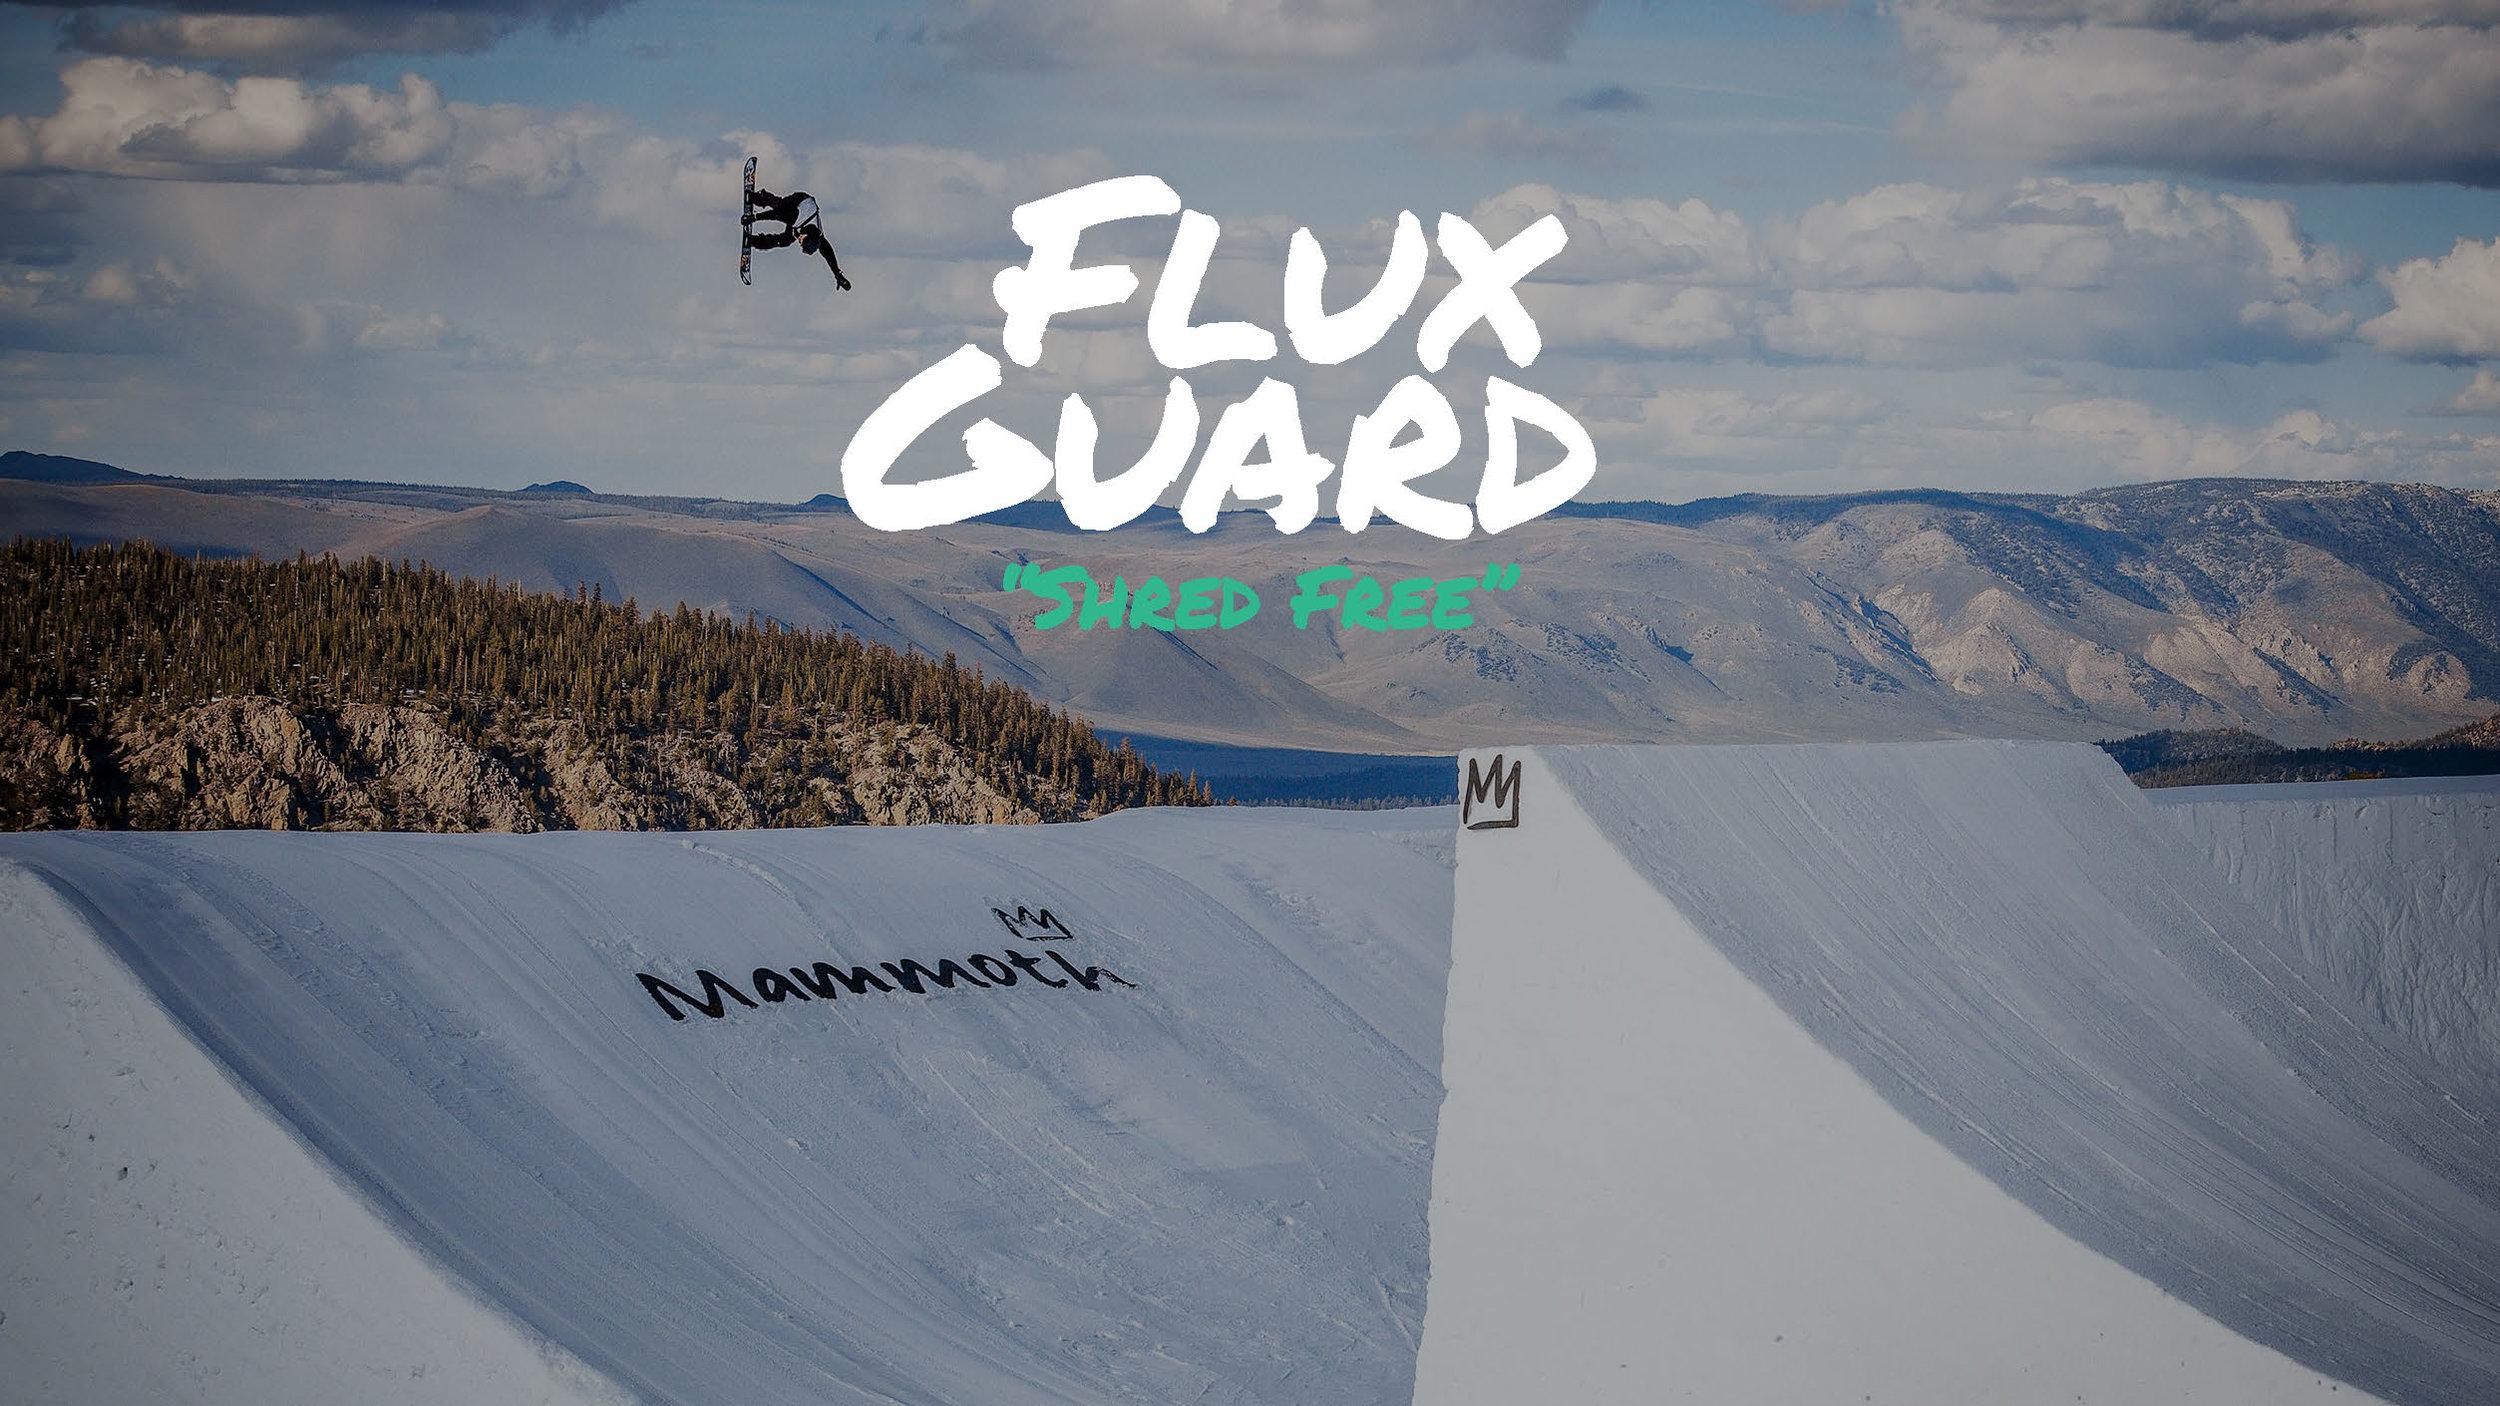 FluxGuard_Thesis_Defensev2.jpg